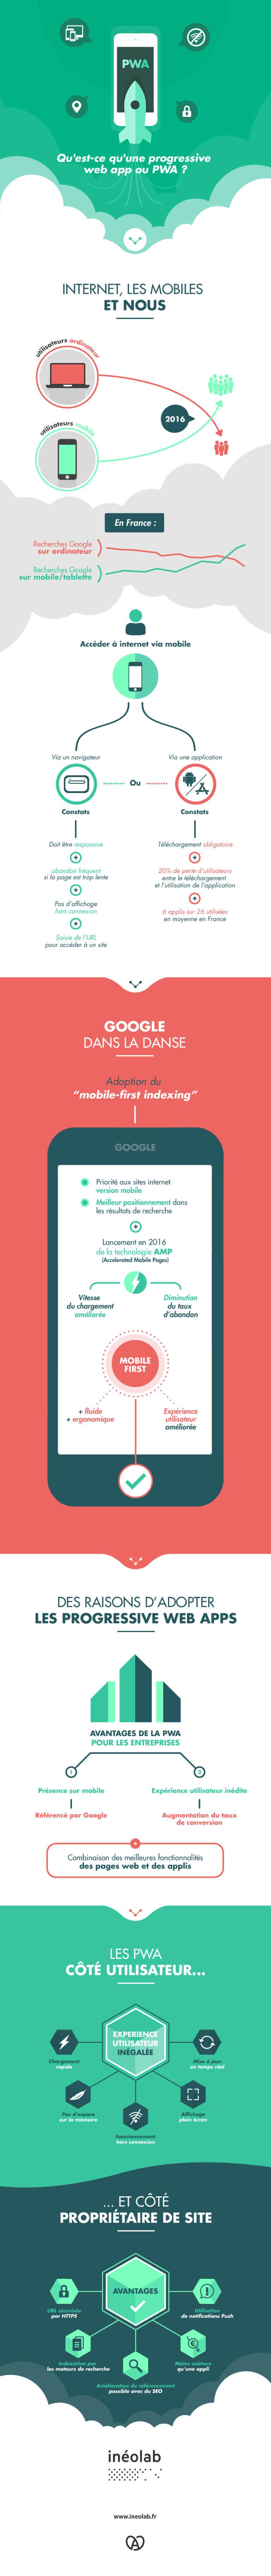 infographie-pwa-progressive-web-app